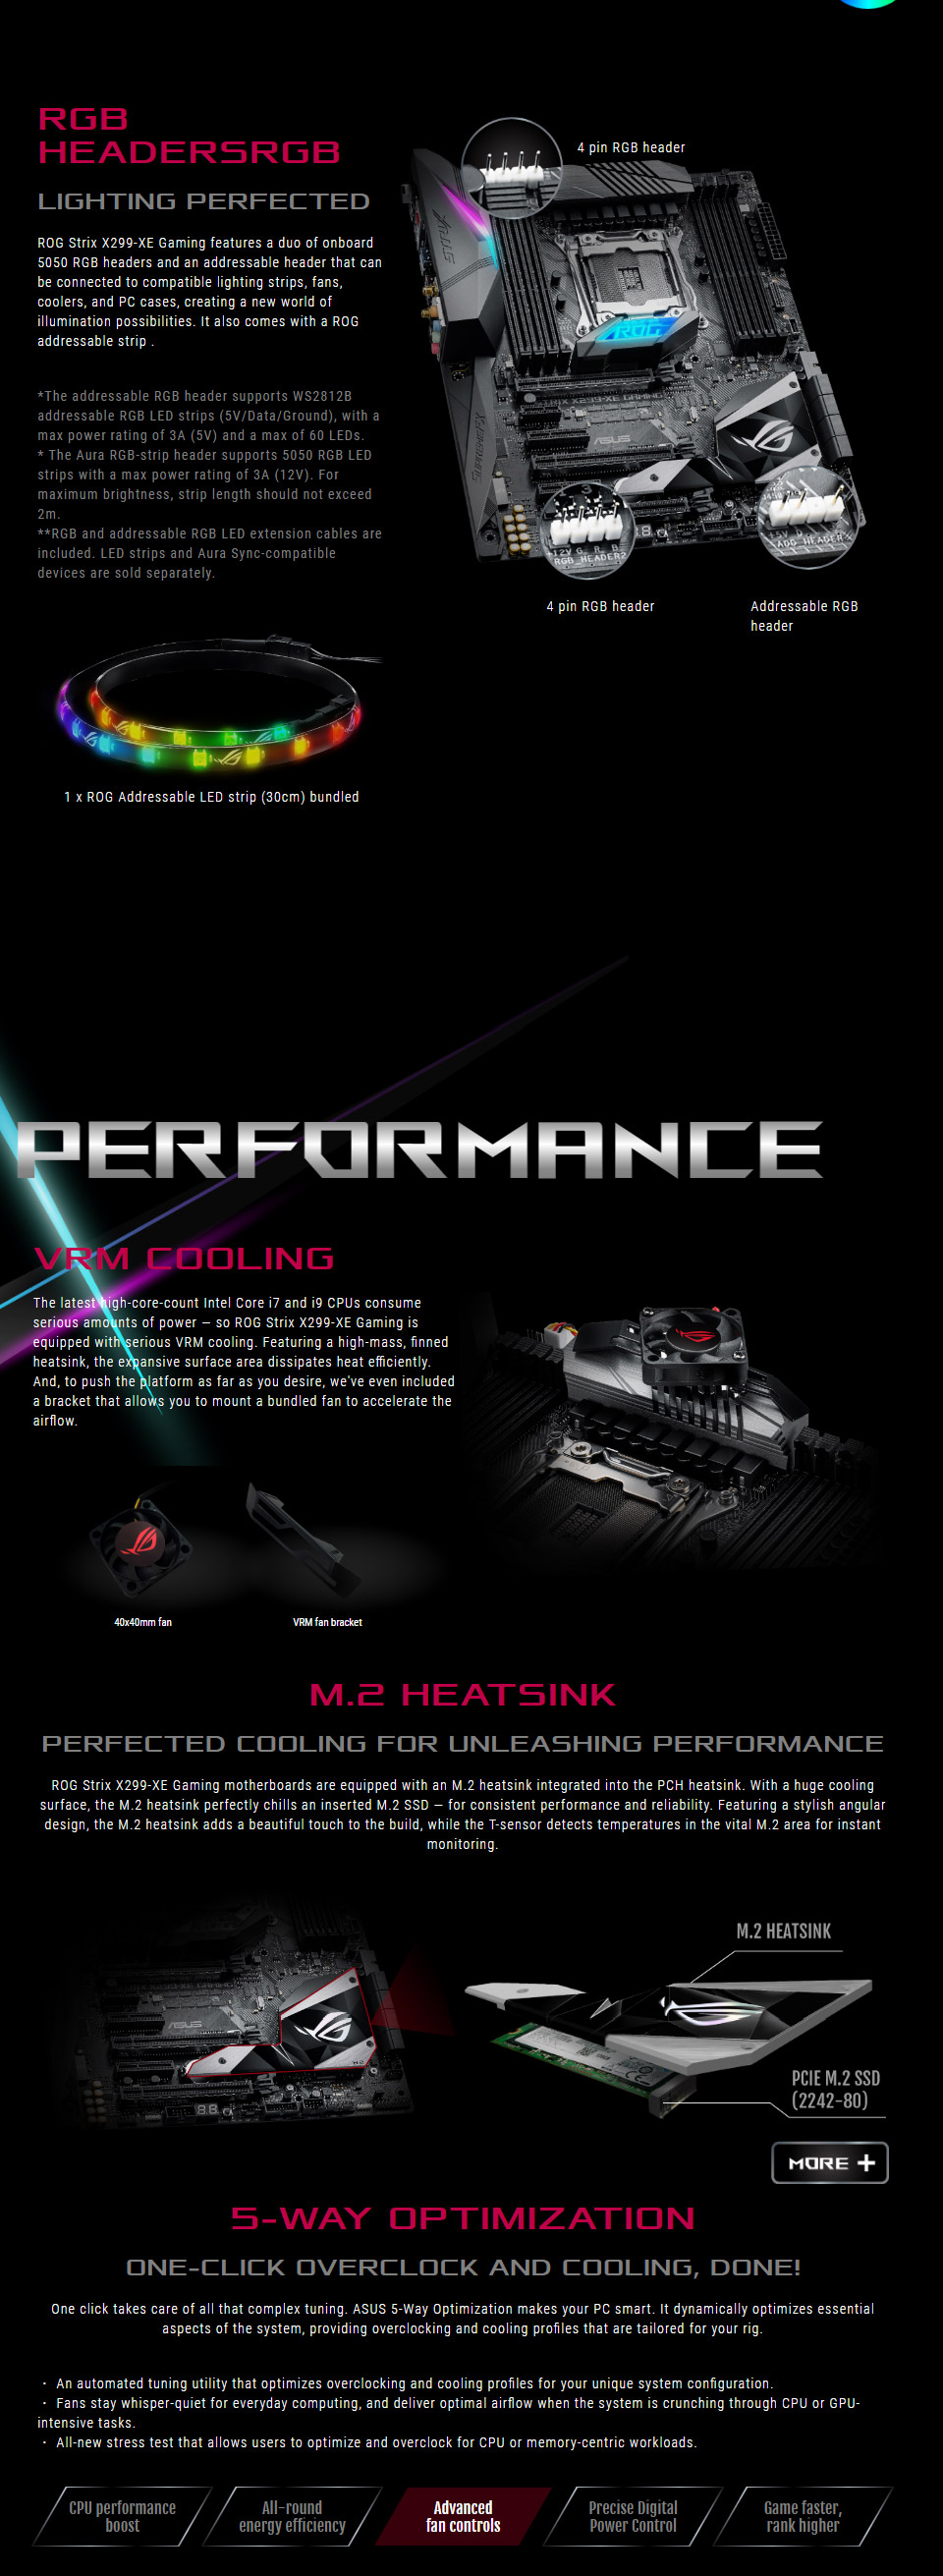 ASUS ROG Strix X299-XE Motherboard [ROG-STRIX-X299-XE-GAMING